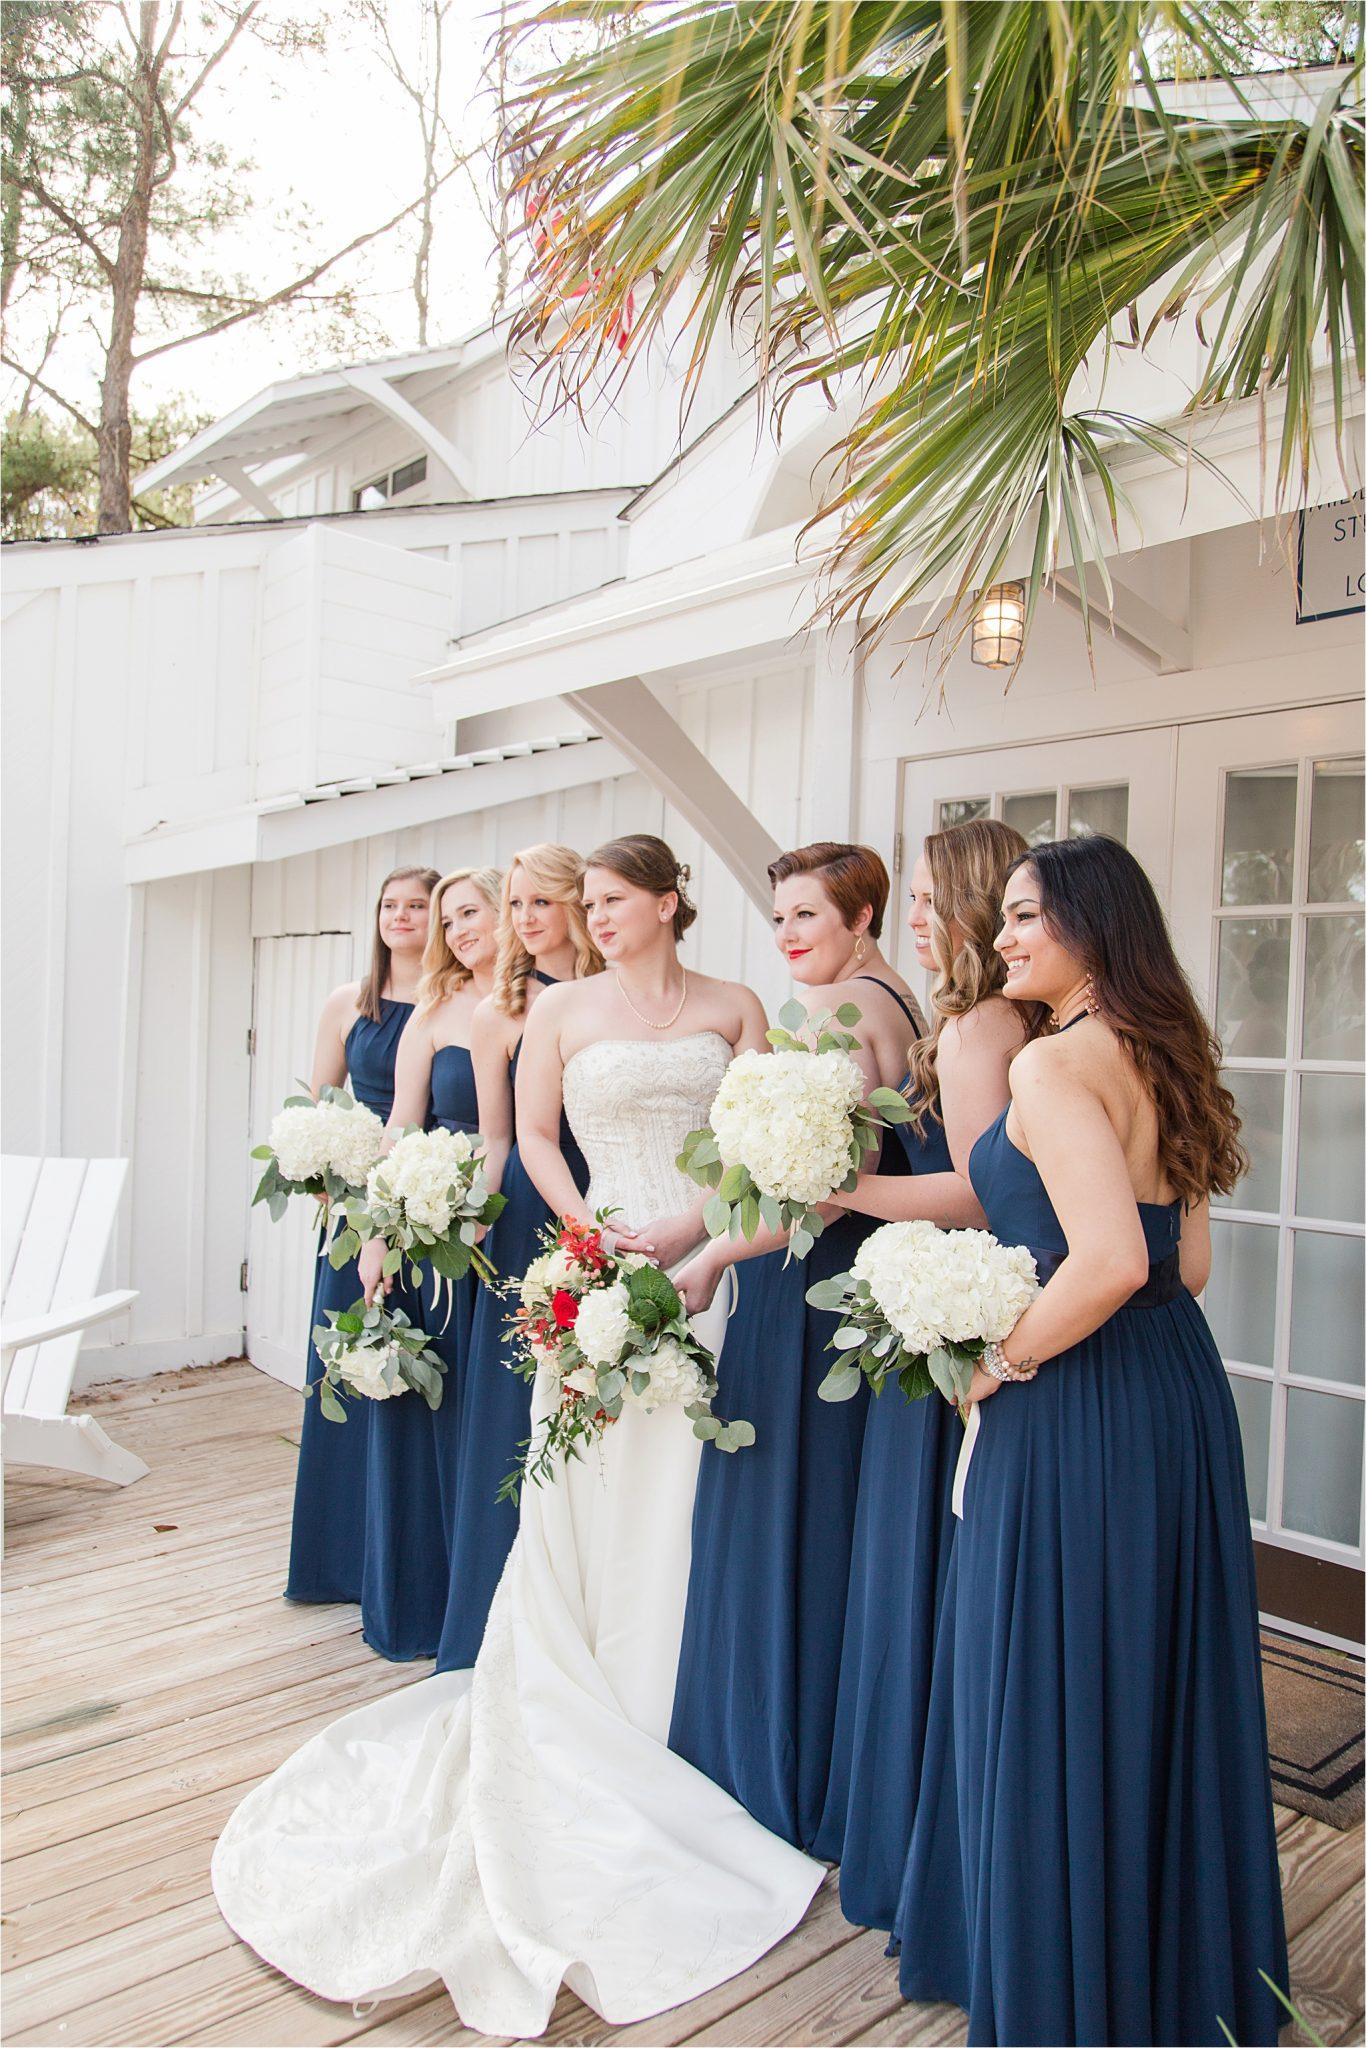 Alabama Wedding Photographer-Little Point Clear Winter Wedding-Meri Beth + Andrew-Bride and Bridesmaids-Wedding Florals-Navy Bridesmaids dresses-Navy themed wedding